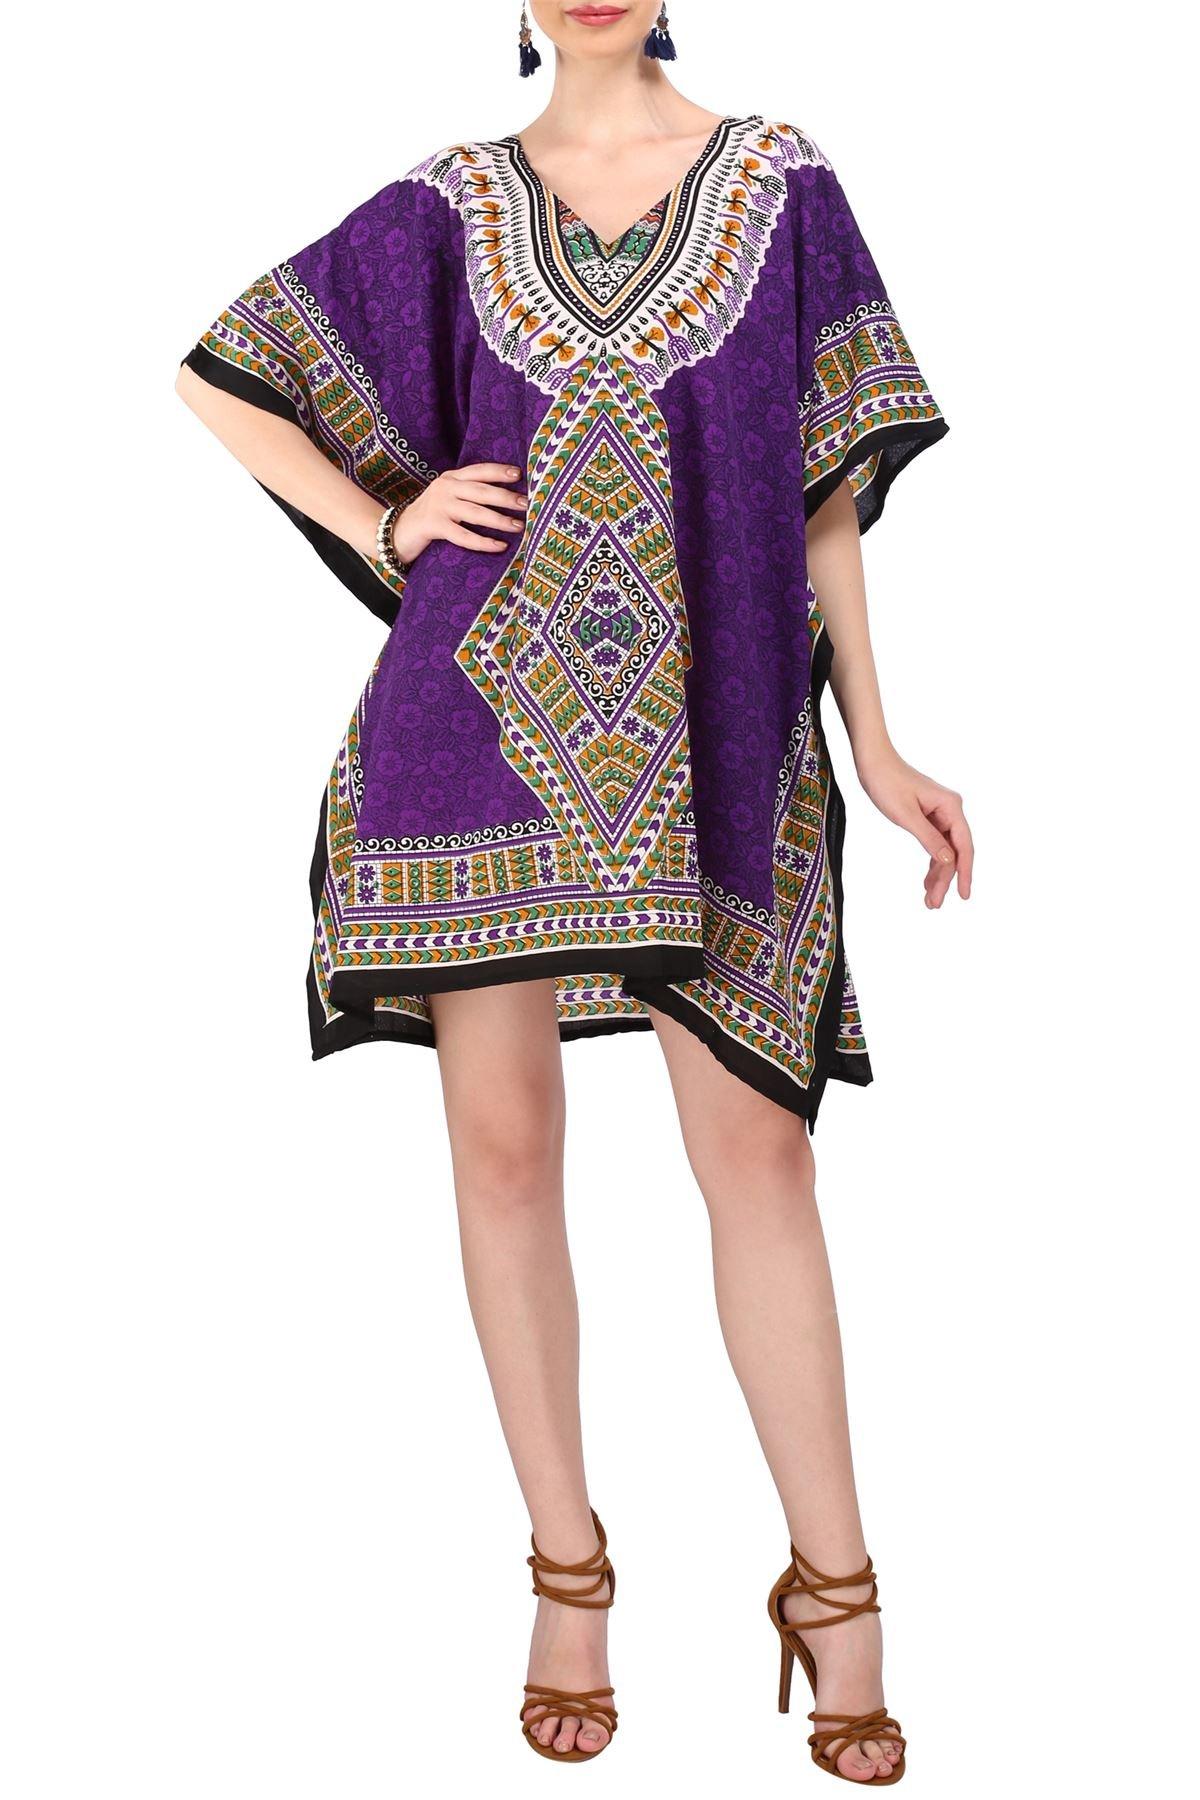 Miss Lavish Women's Kaftan Tunic Kimono Style Dress Summer Beach Cover Up Plus Size by Miss Lavish